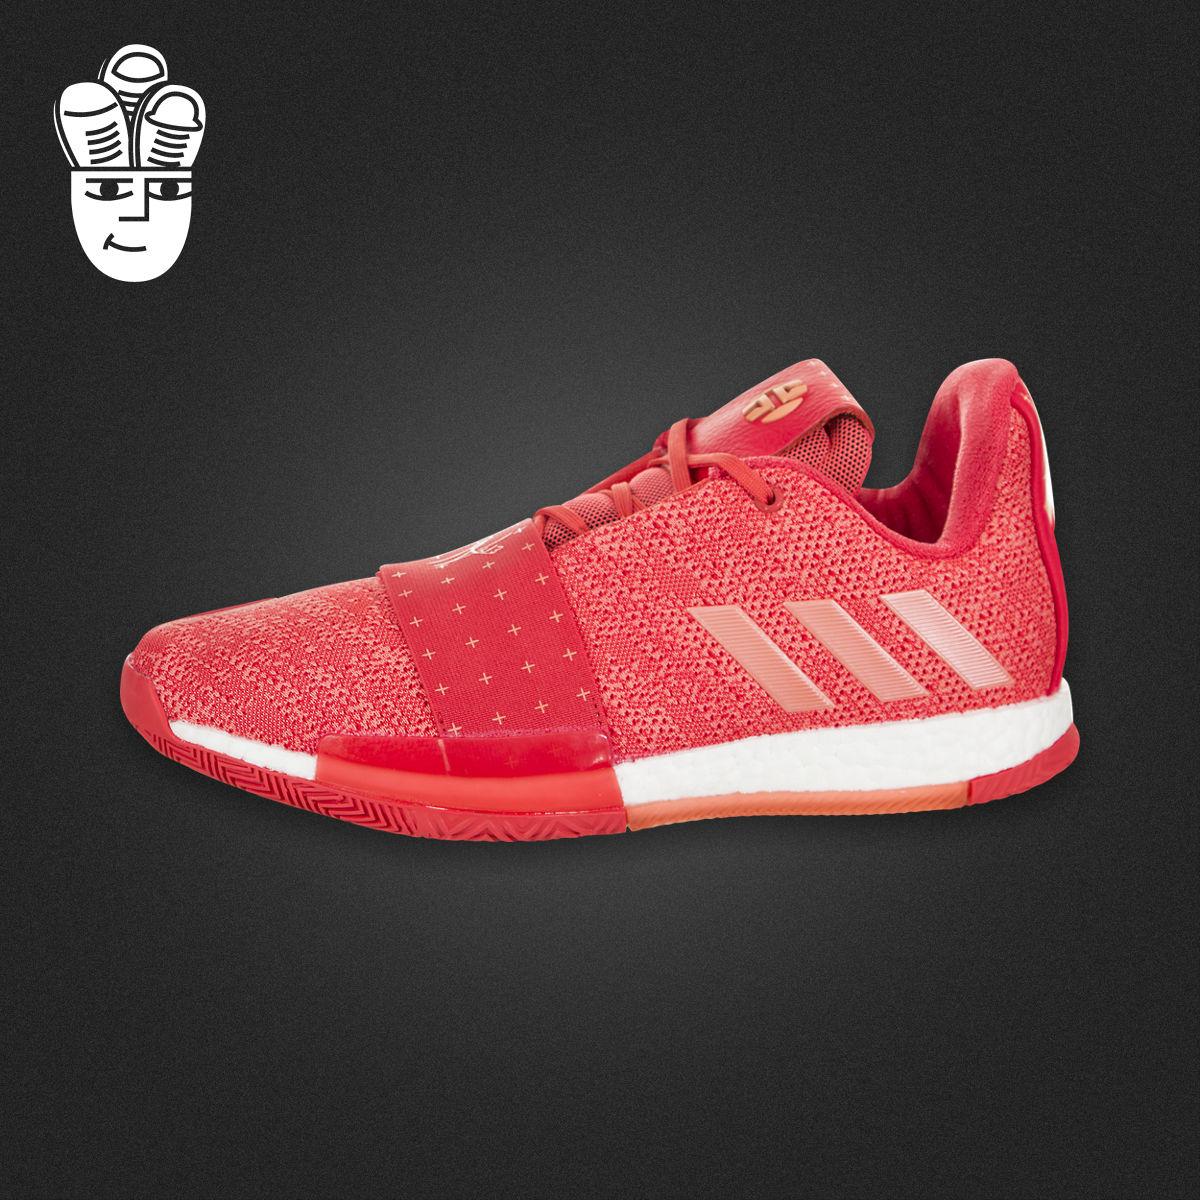 Adidas Harden Vol. 3阿迪达斯篮球鞋 哈登3代签名鞋 d96990